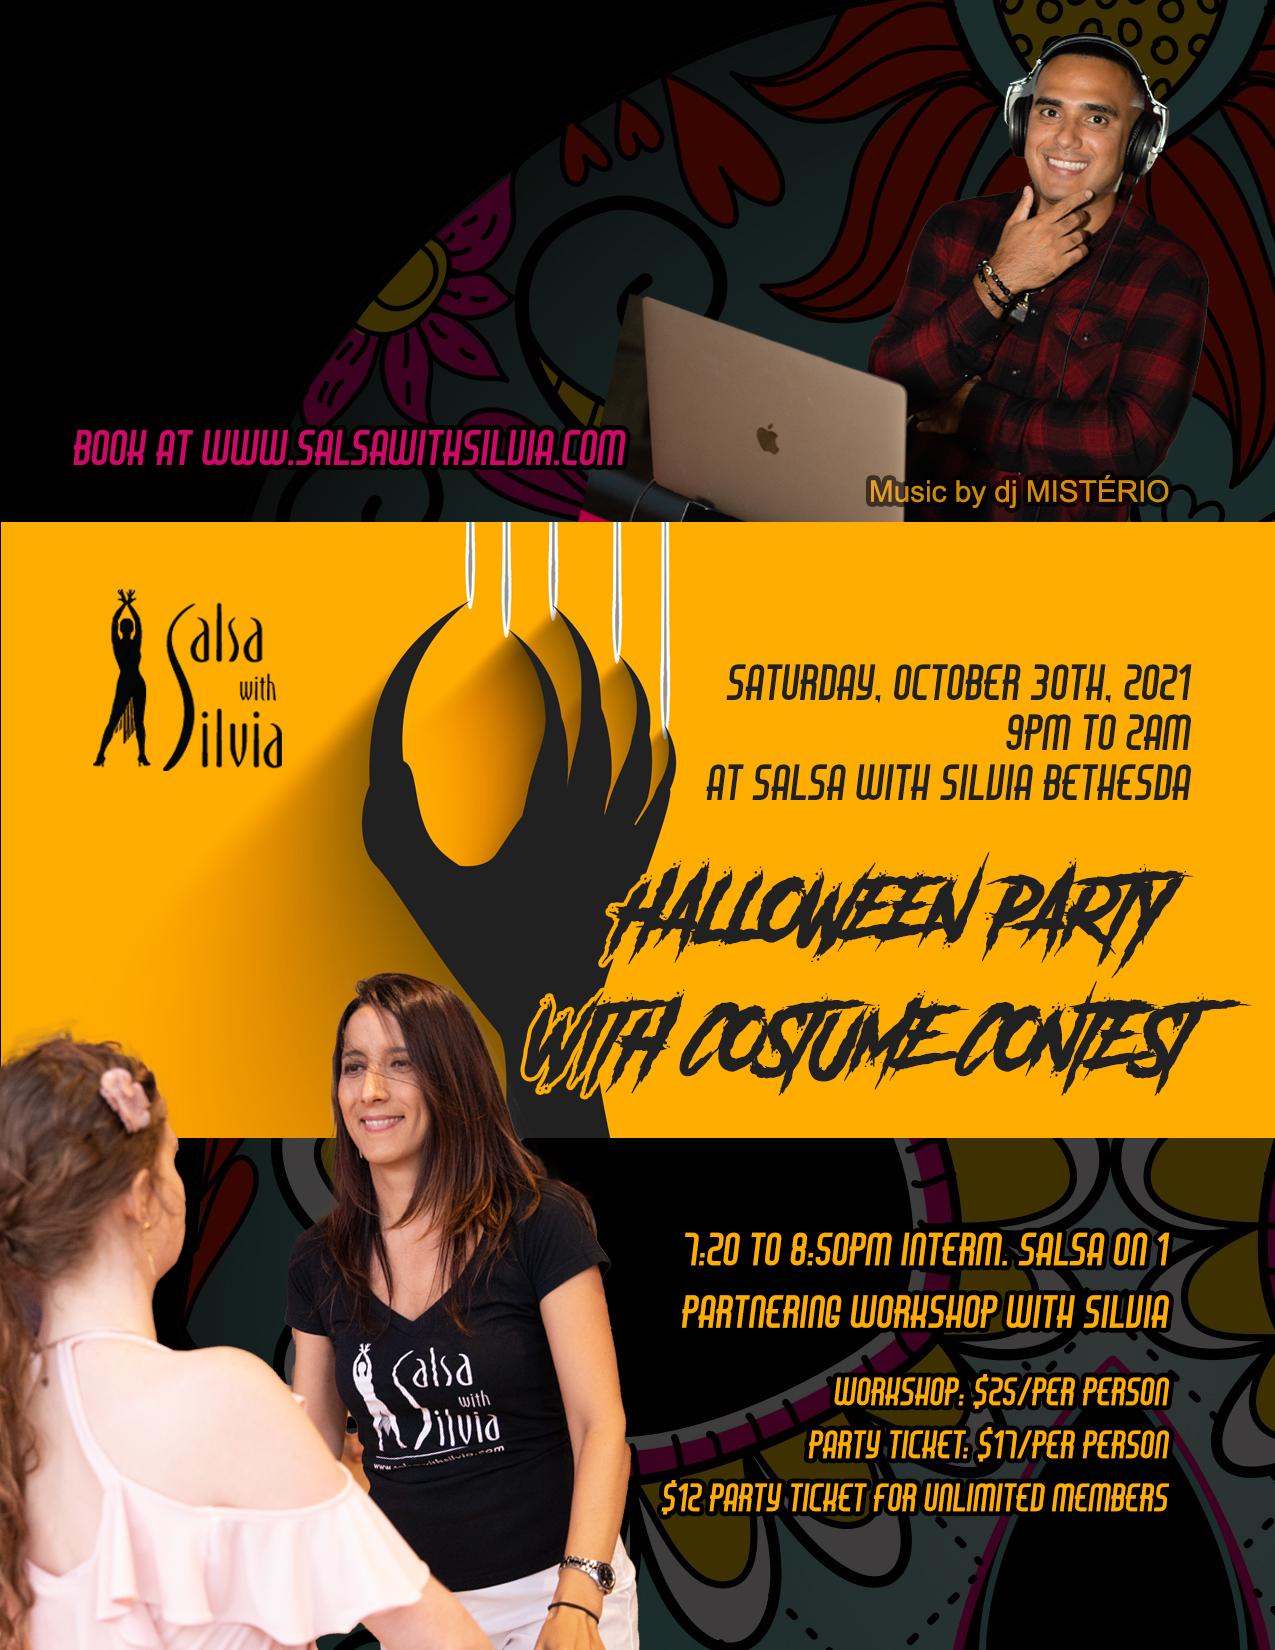 Halloween Salsa, Bachata, Kizomba party at the Salsa With Silvia dance studio in Bethesda, MD